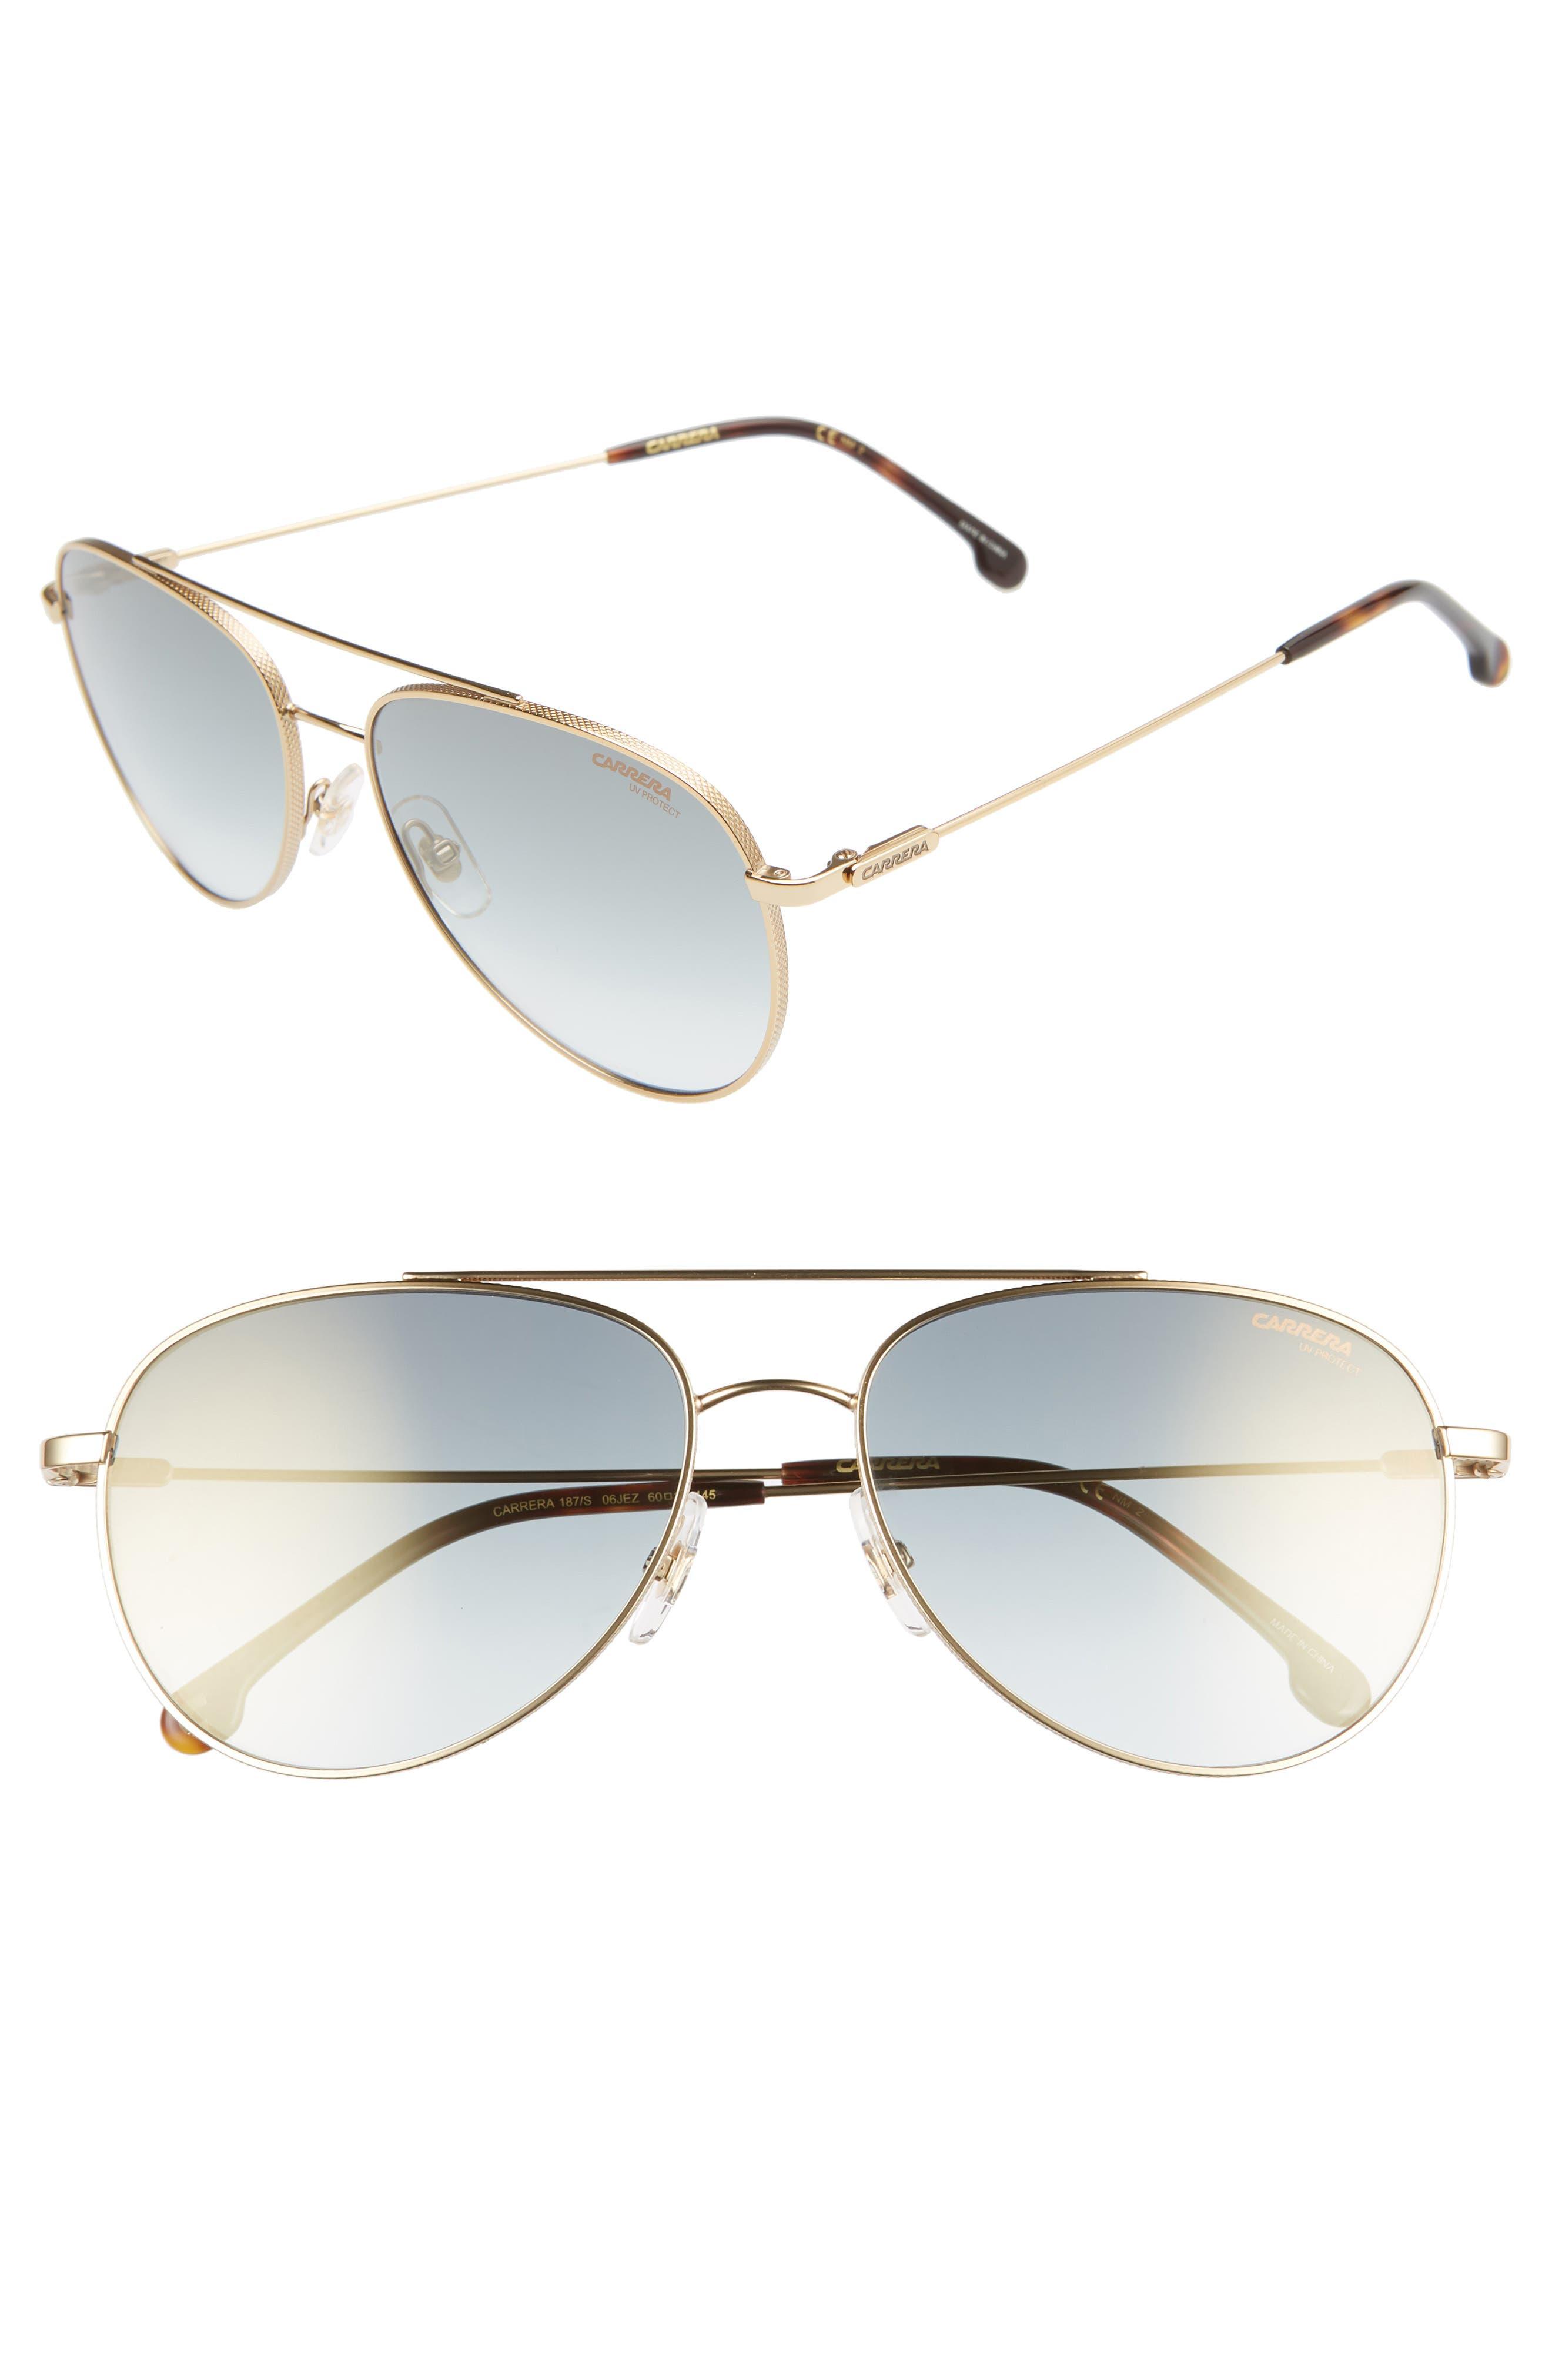 66179b64a4 Carrera Eyewear 60Mm Aviator Sunglasses - Gold Havana